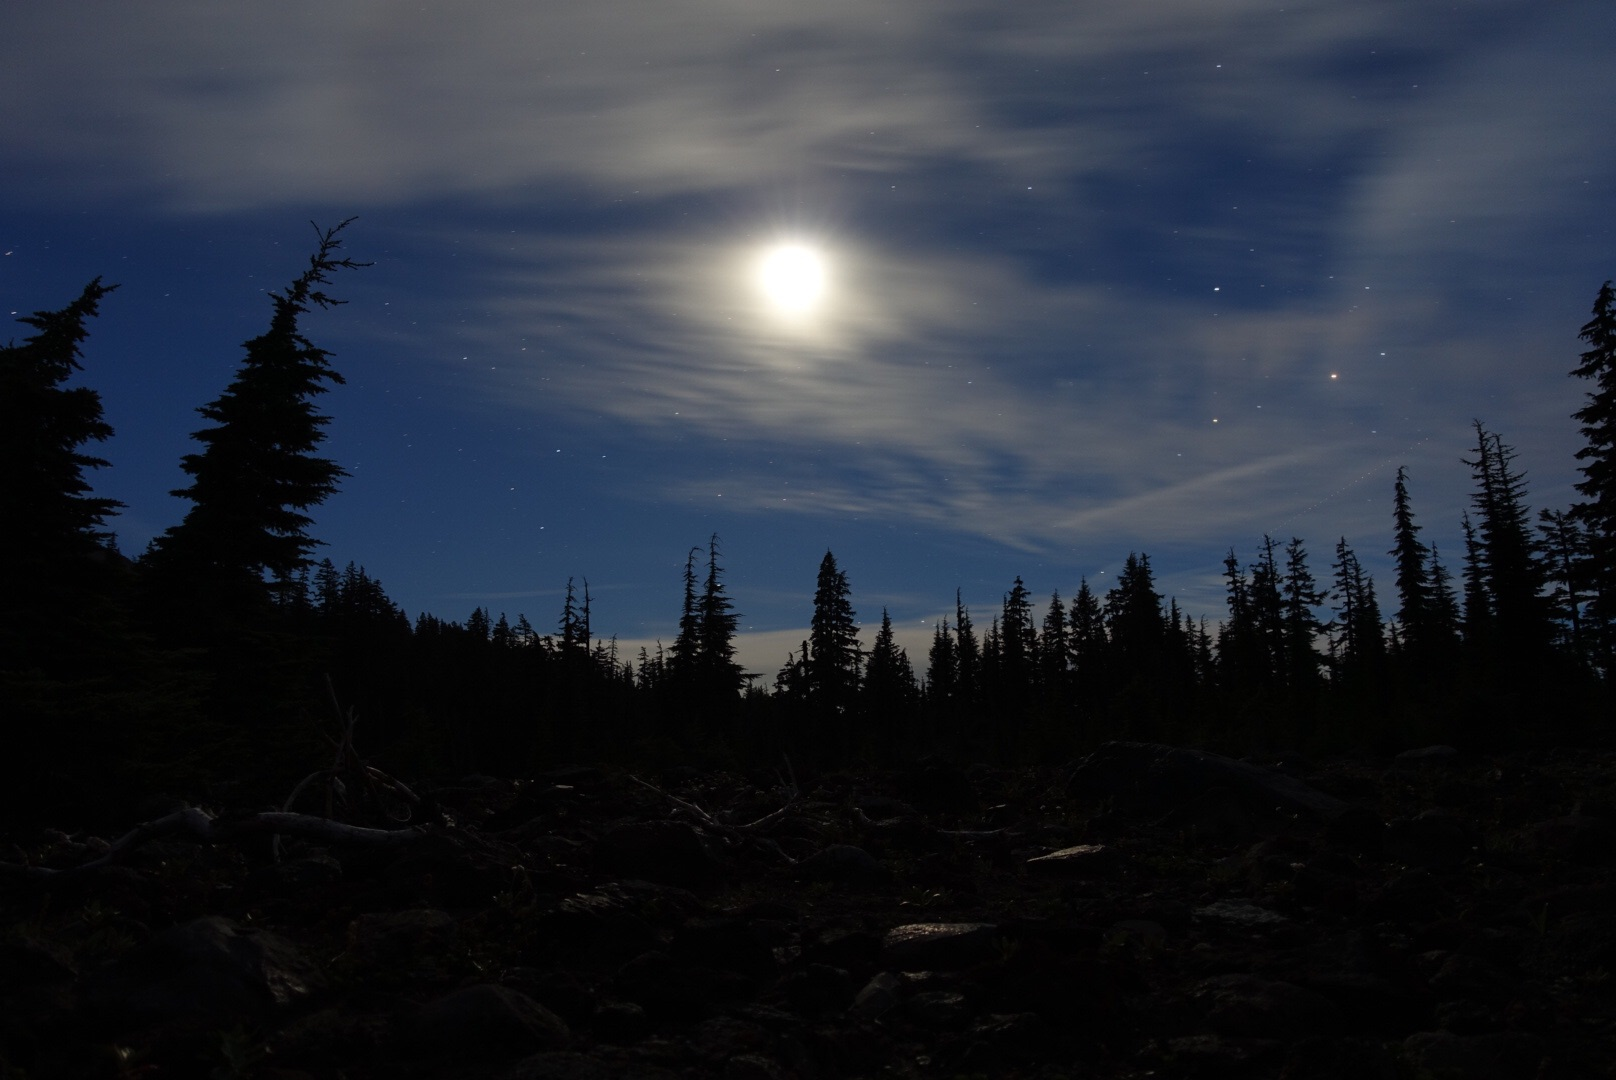 Nearly full moon illuminating clouds with Scorpio, Mars and Saturn